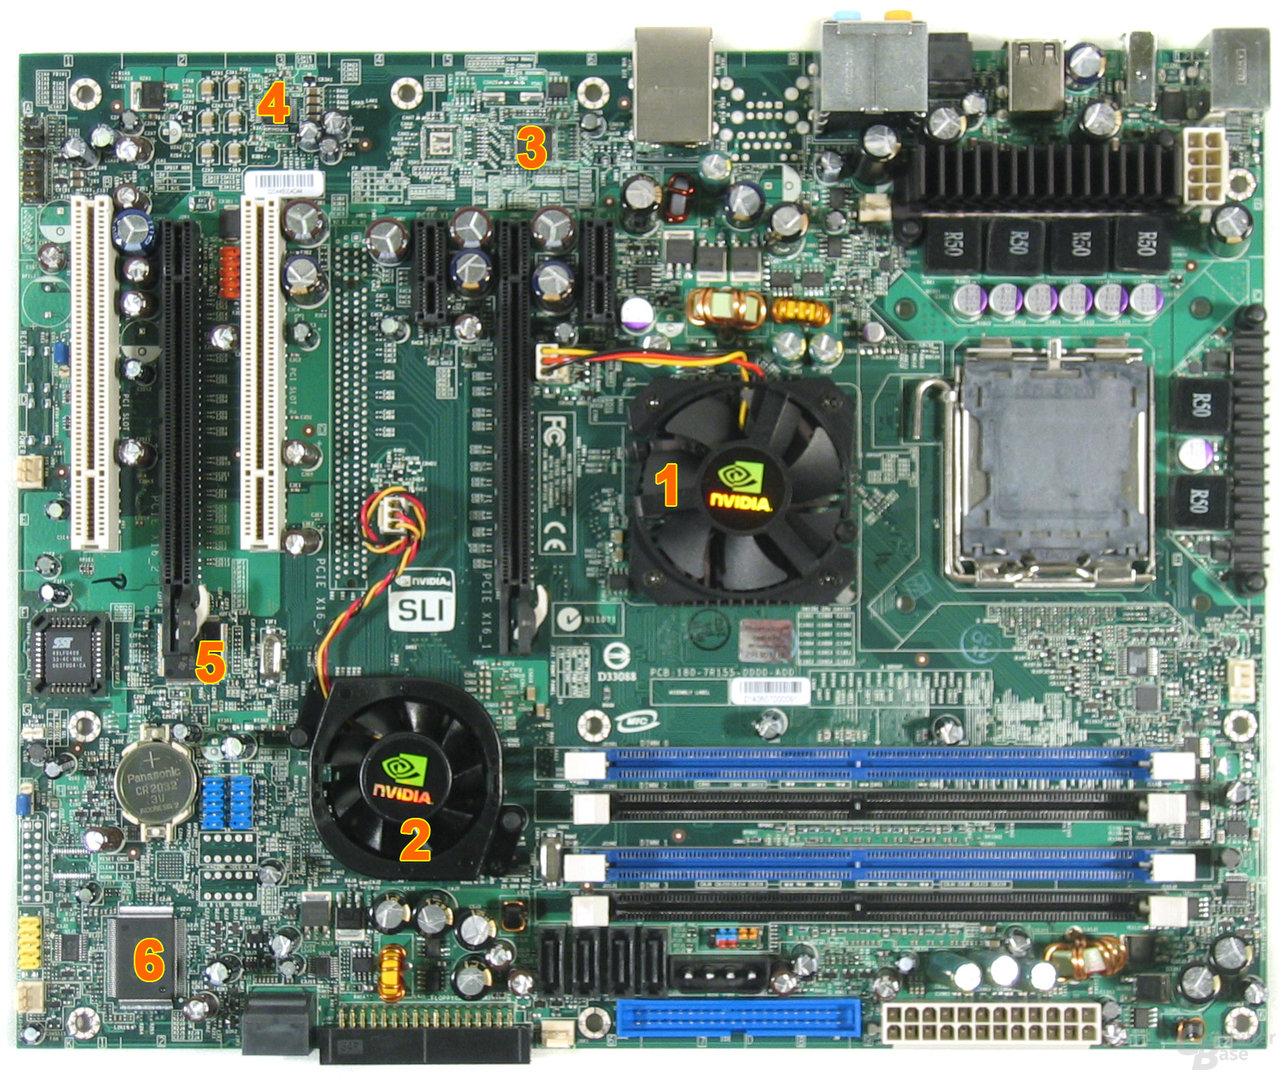 EVGA 122-CK-NF67 Komponenten